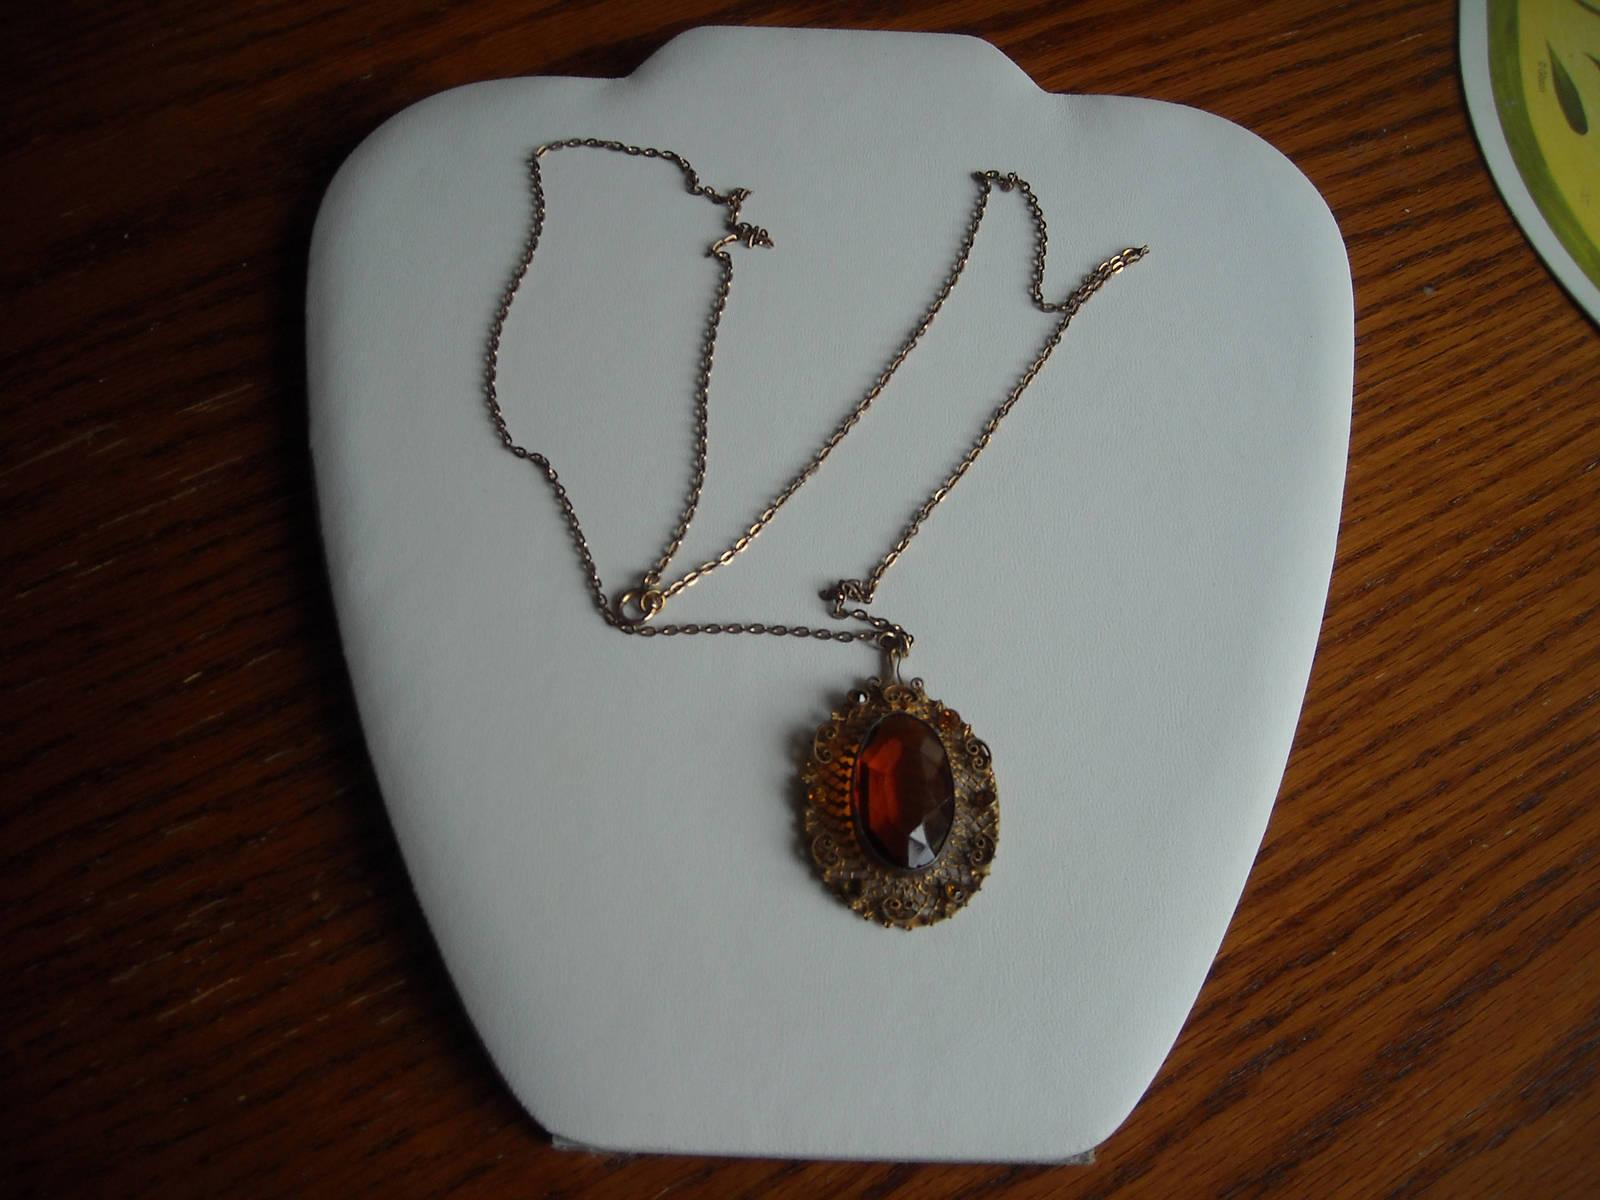 Vintage Gold Tone Filigree Necklace With A Golden Amber Glass Center & Side Sets image 3